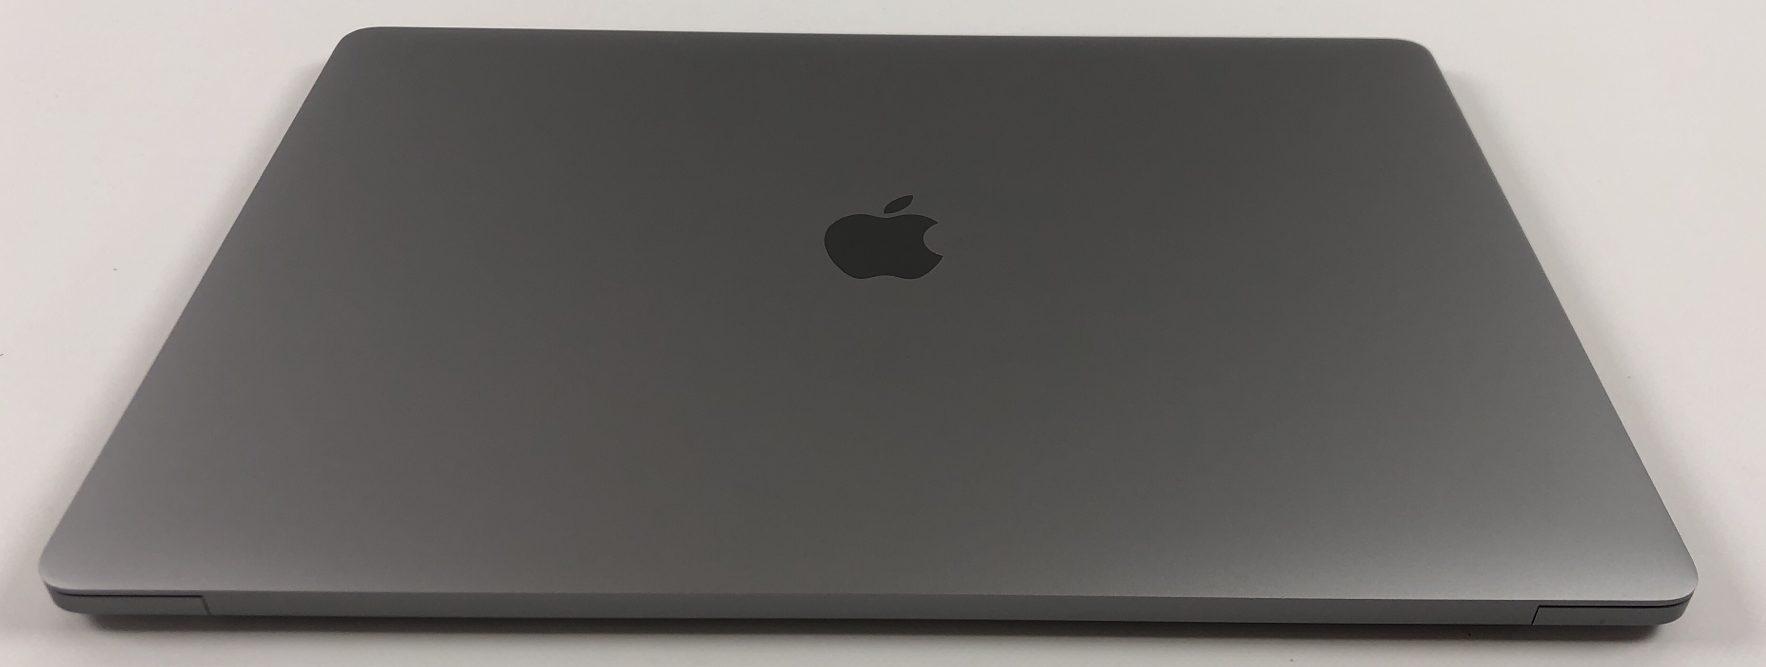 "MacBook Pro 15"" Touch Bar Mid 2019 (Intel 8-Core i9 2.3 GHz 16 GB RAM 512 GB SSD), Space Gray, Intel 8-Core i9 2.3 GHz, 16 GB RAM, 512 GB SSD, imagen 2"